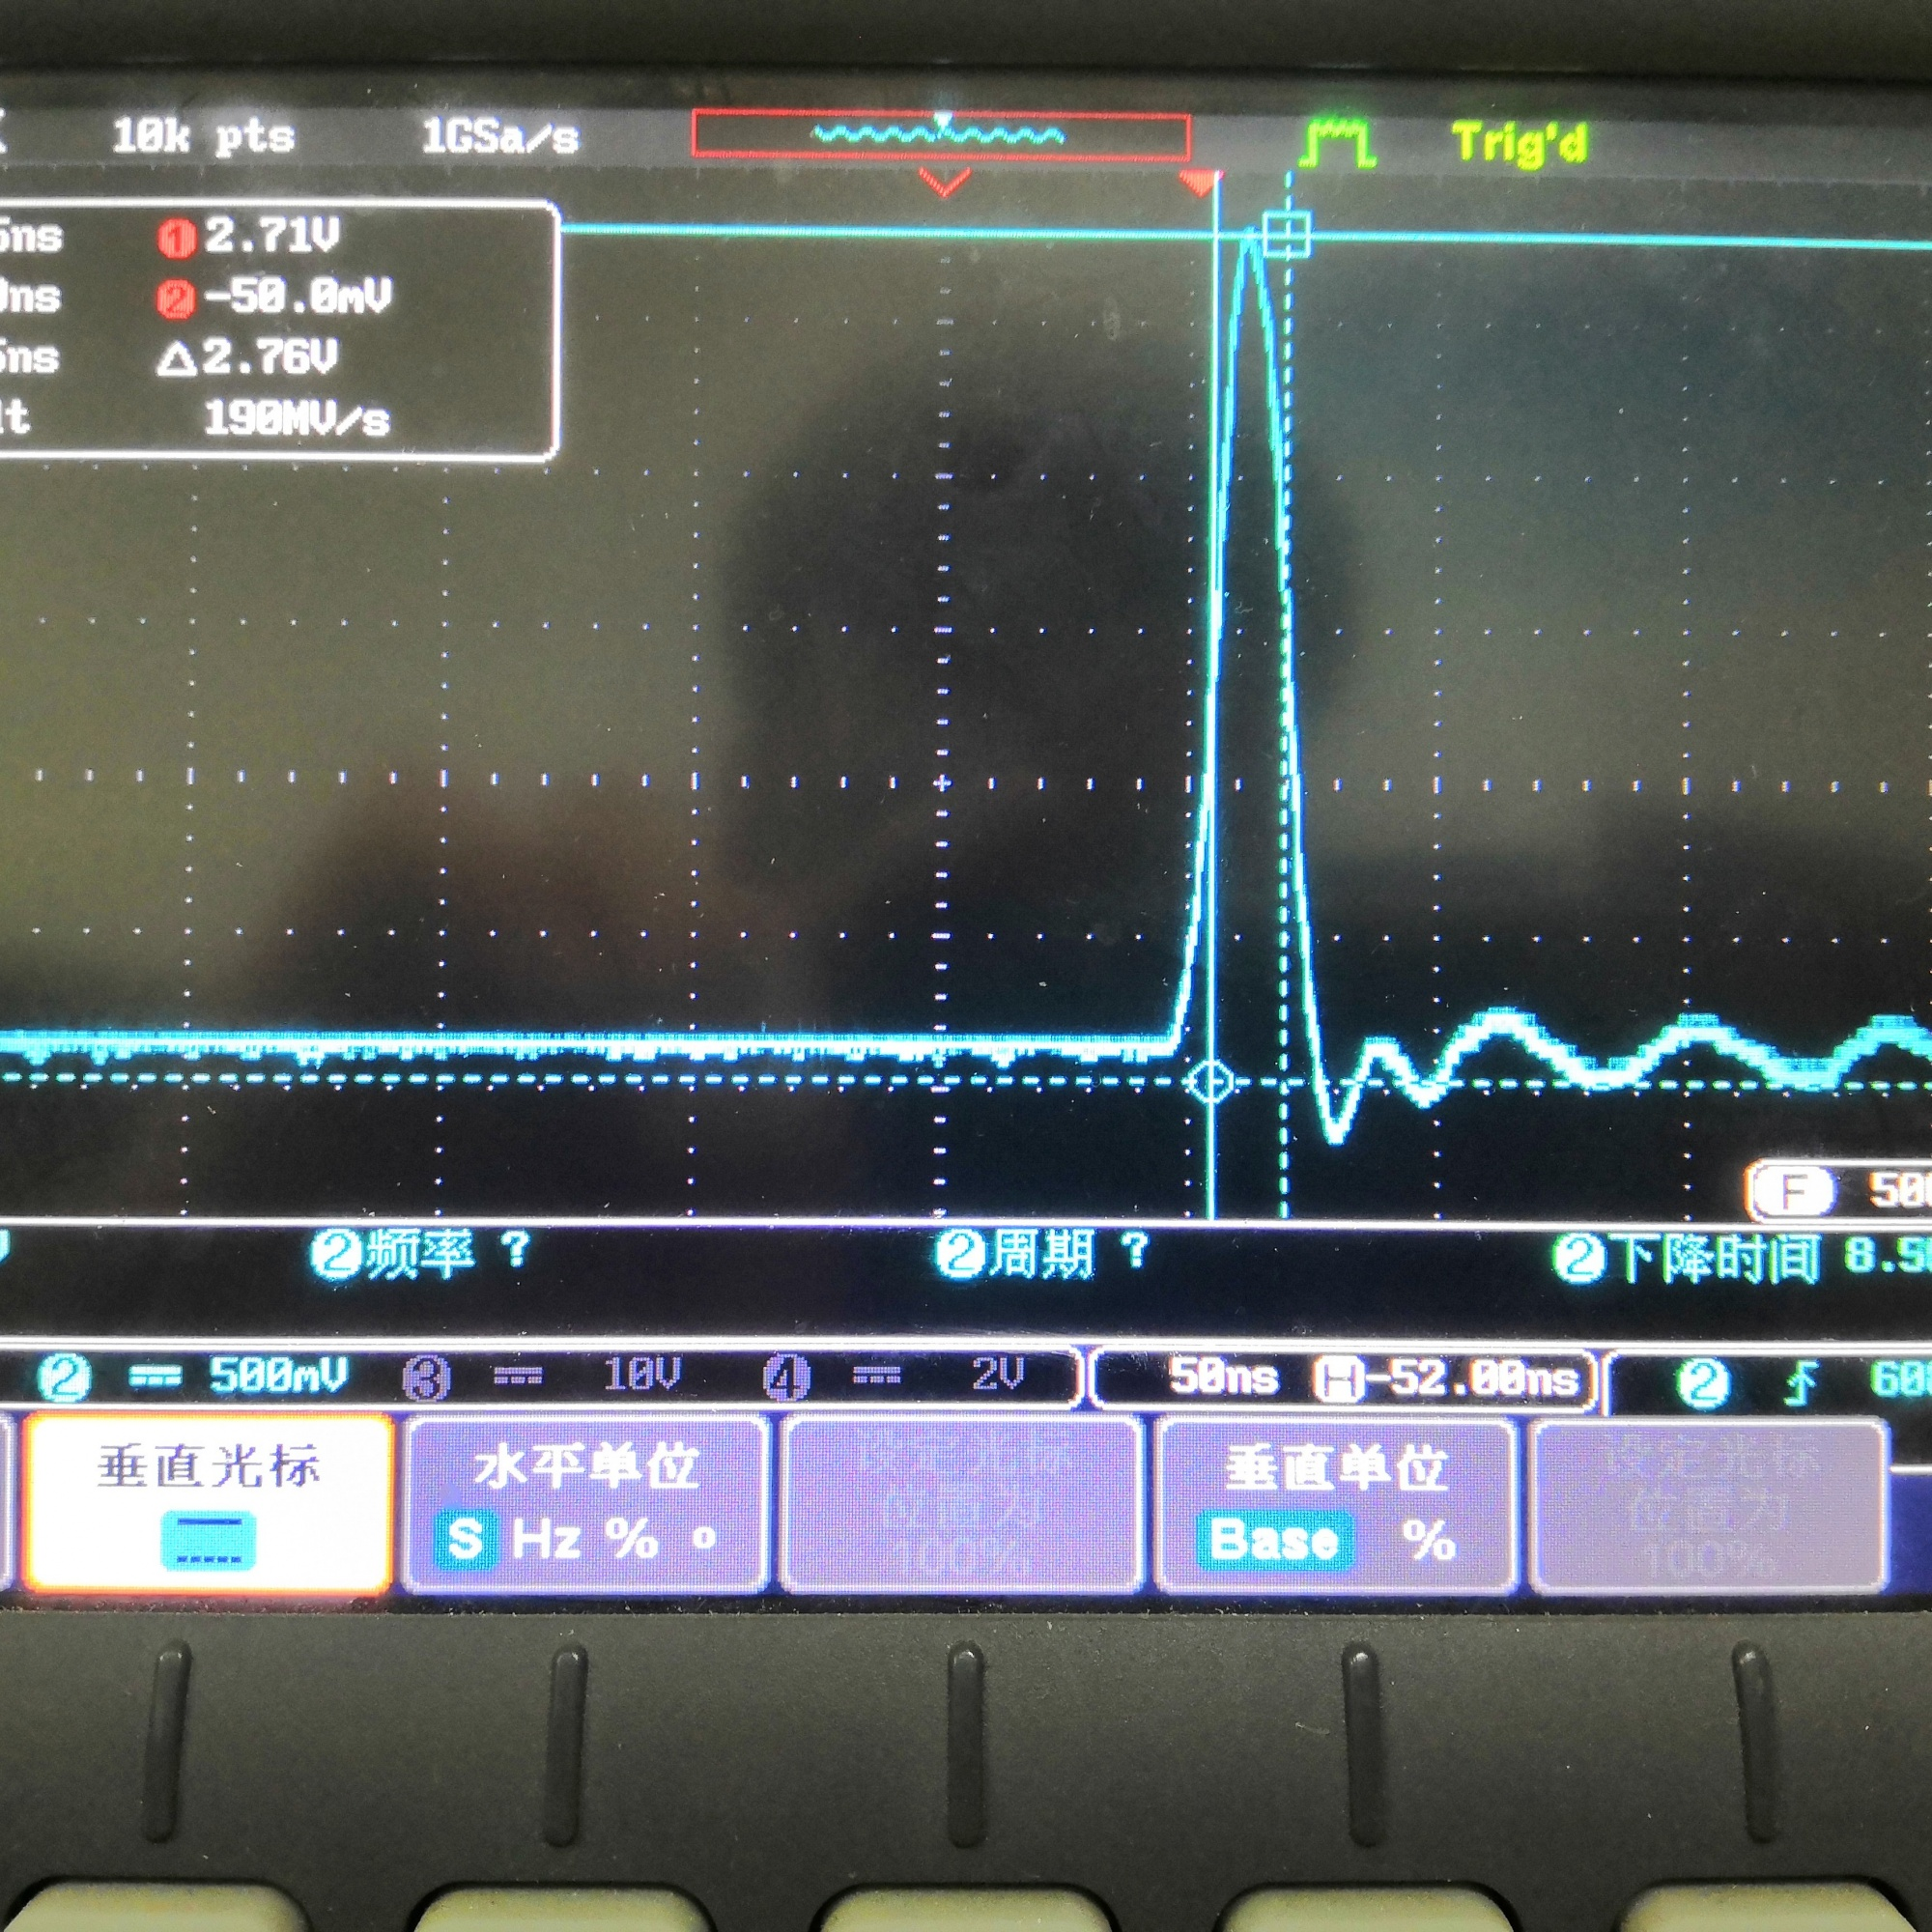 MG82F6D17 PAC 输出144Mhz 频率的脉宽PWM疑问